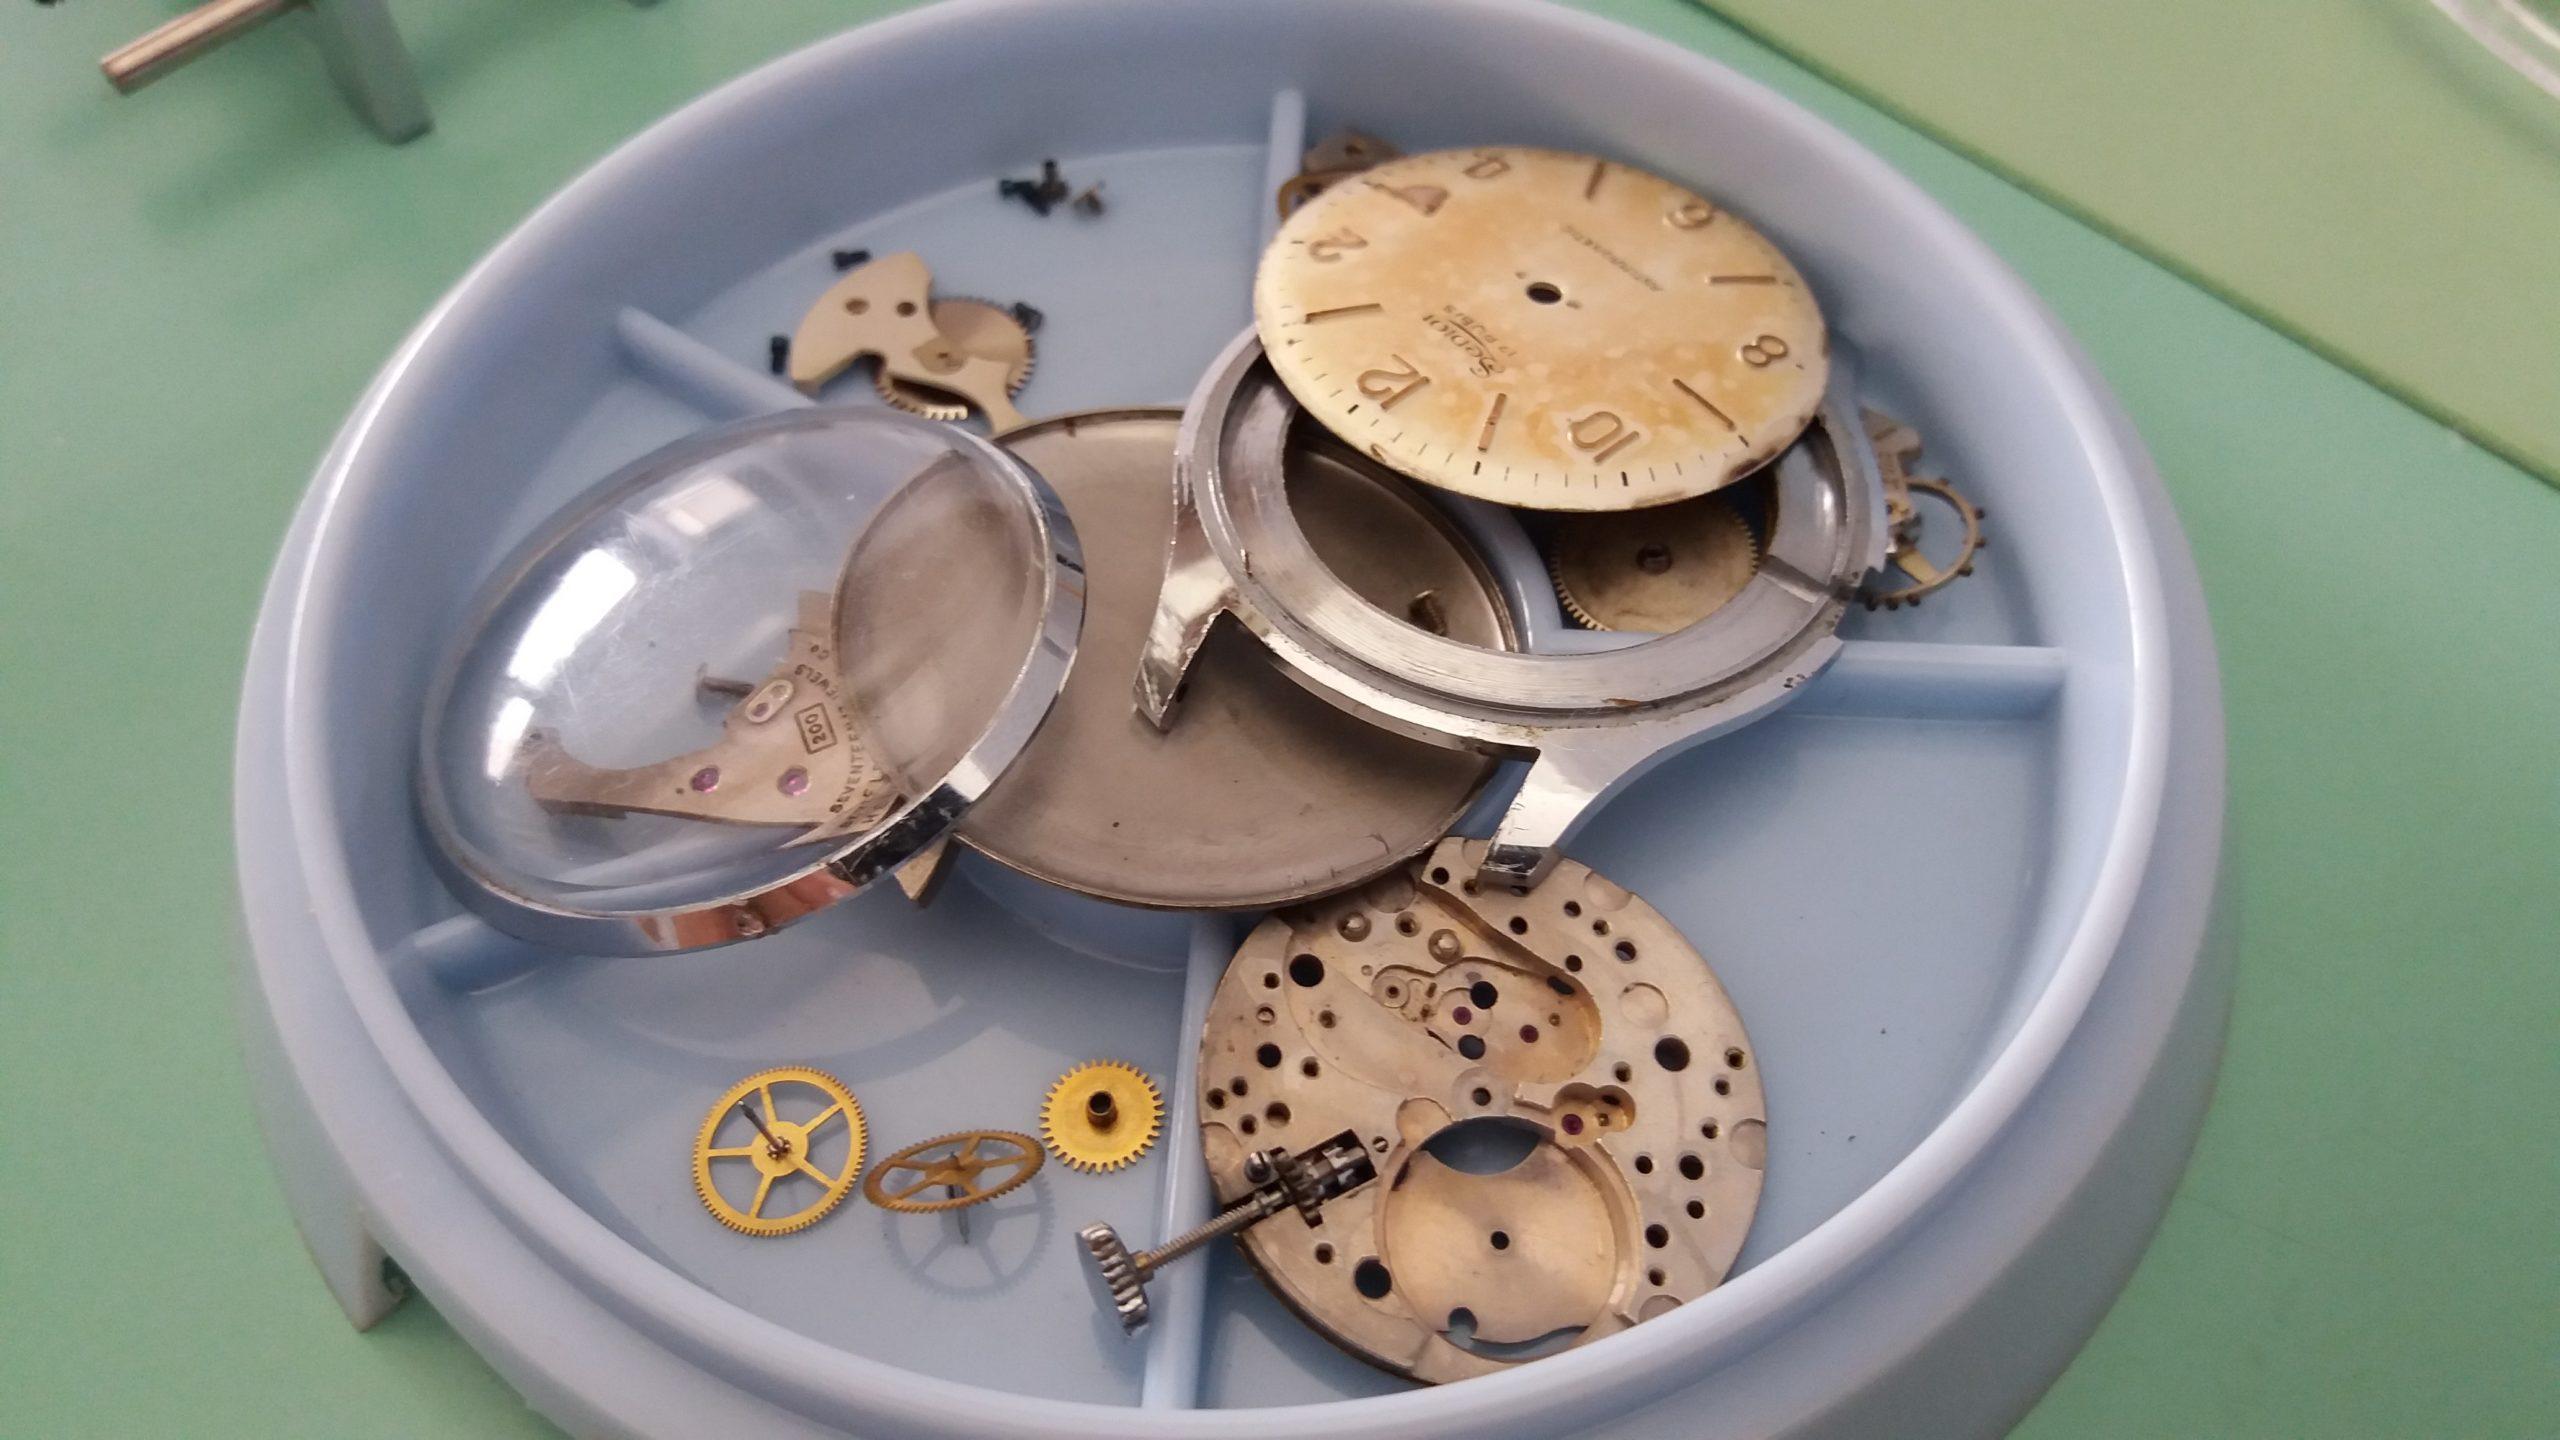 orologio smontato laboratorio